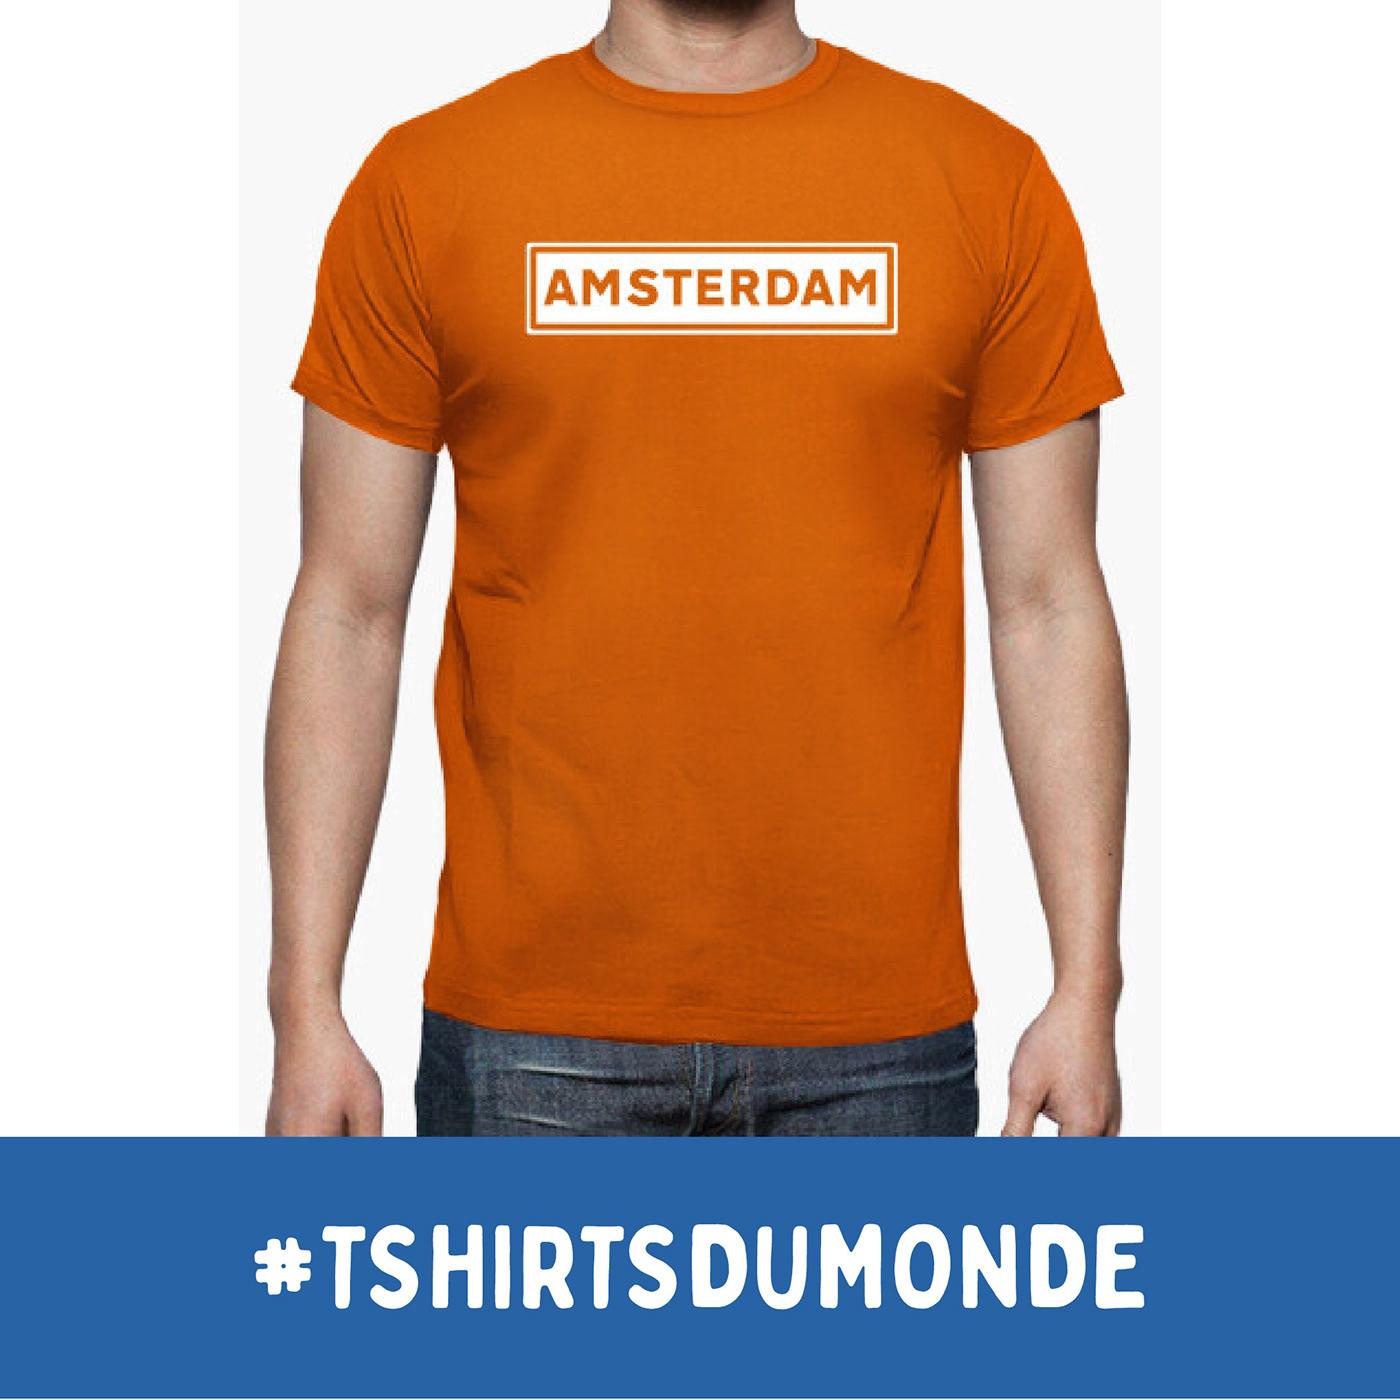 AMSTERDAM / T-SHIRTS DU MONDE Collection, by Brassens Studio / ©Tomás Sastre